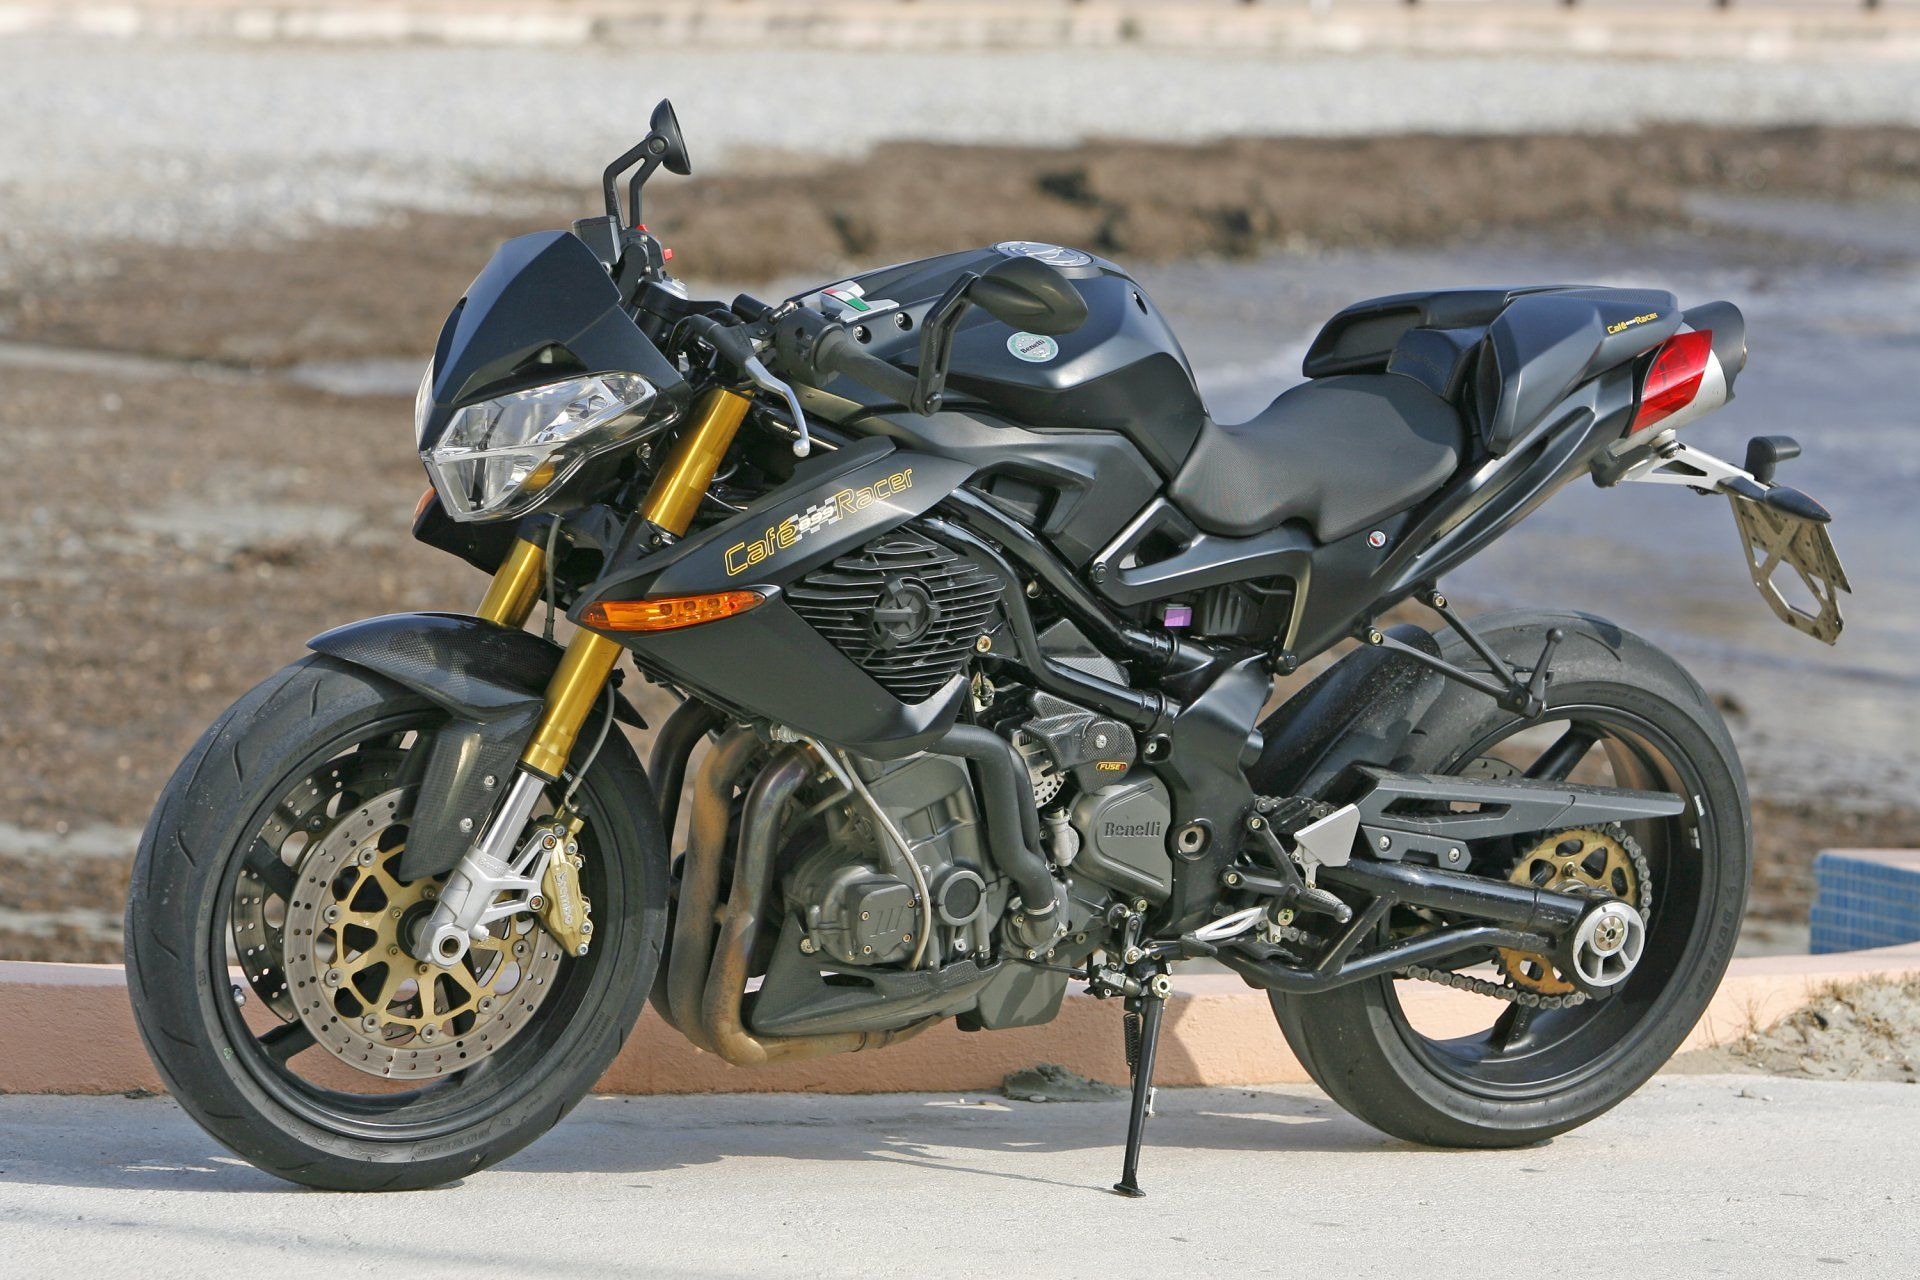 constructeur de moto italien benelli moto scooter motos d 39 occasion. Black Bedroom Furniture Sets. Home Design Ideas